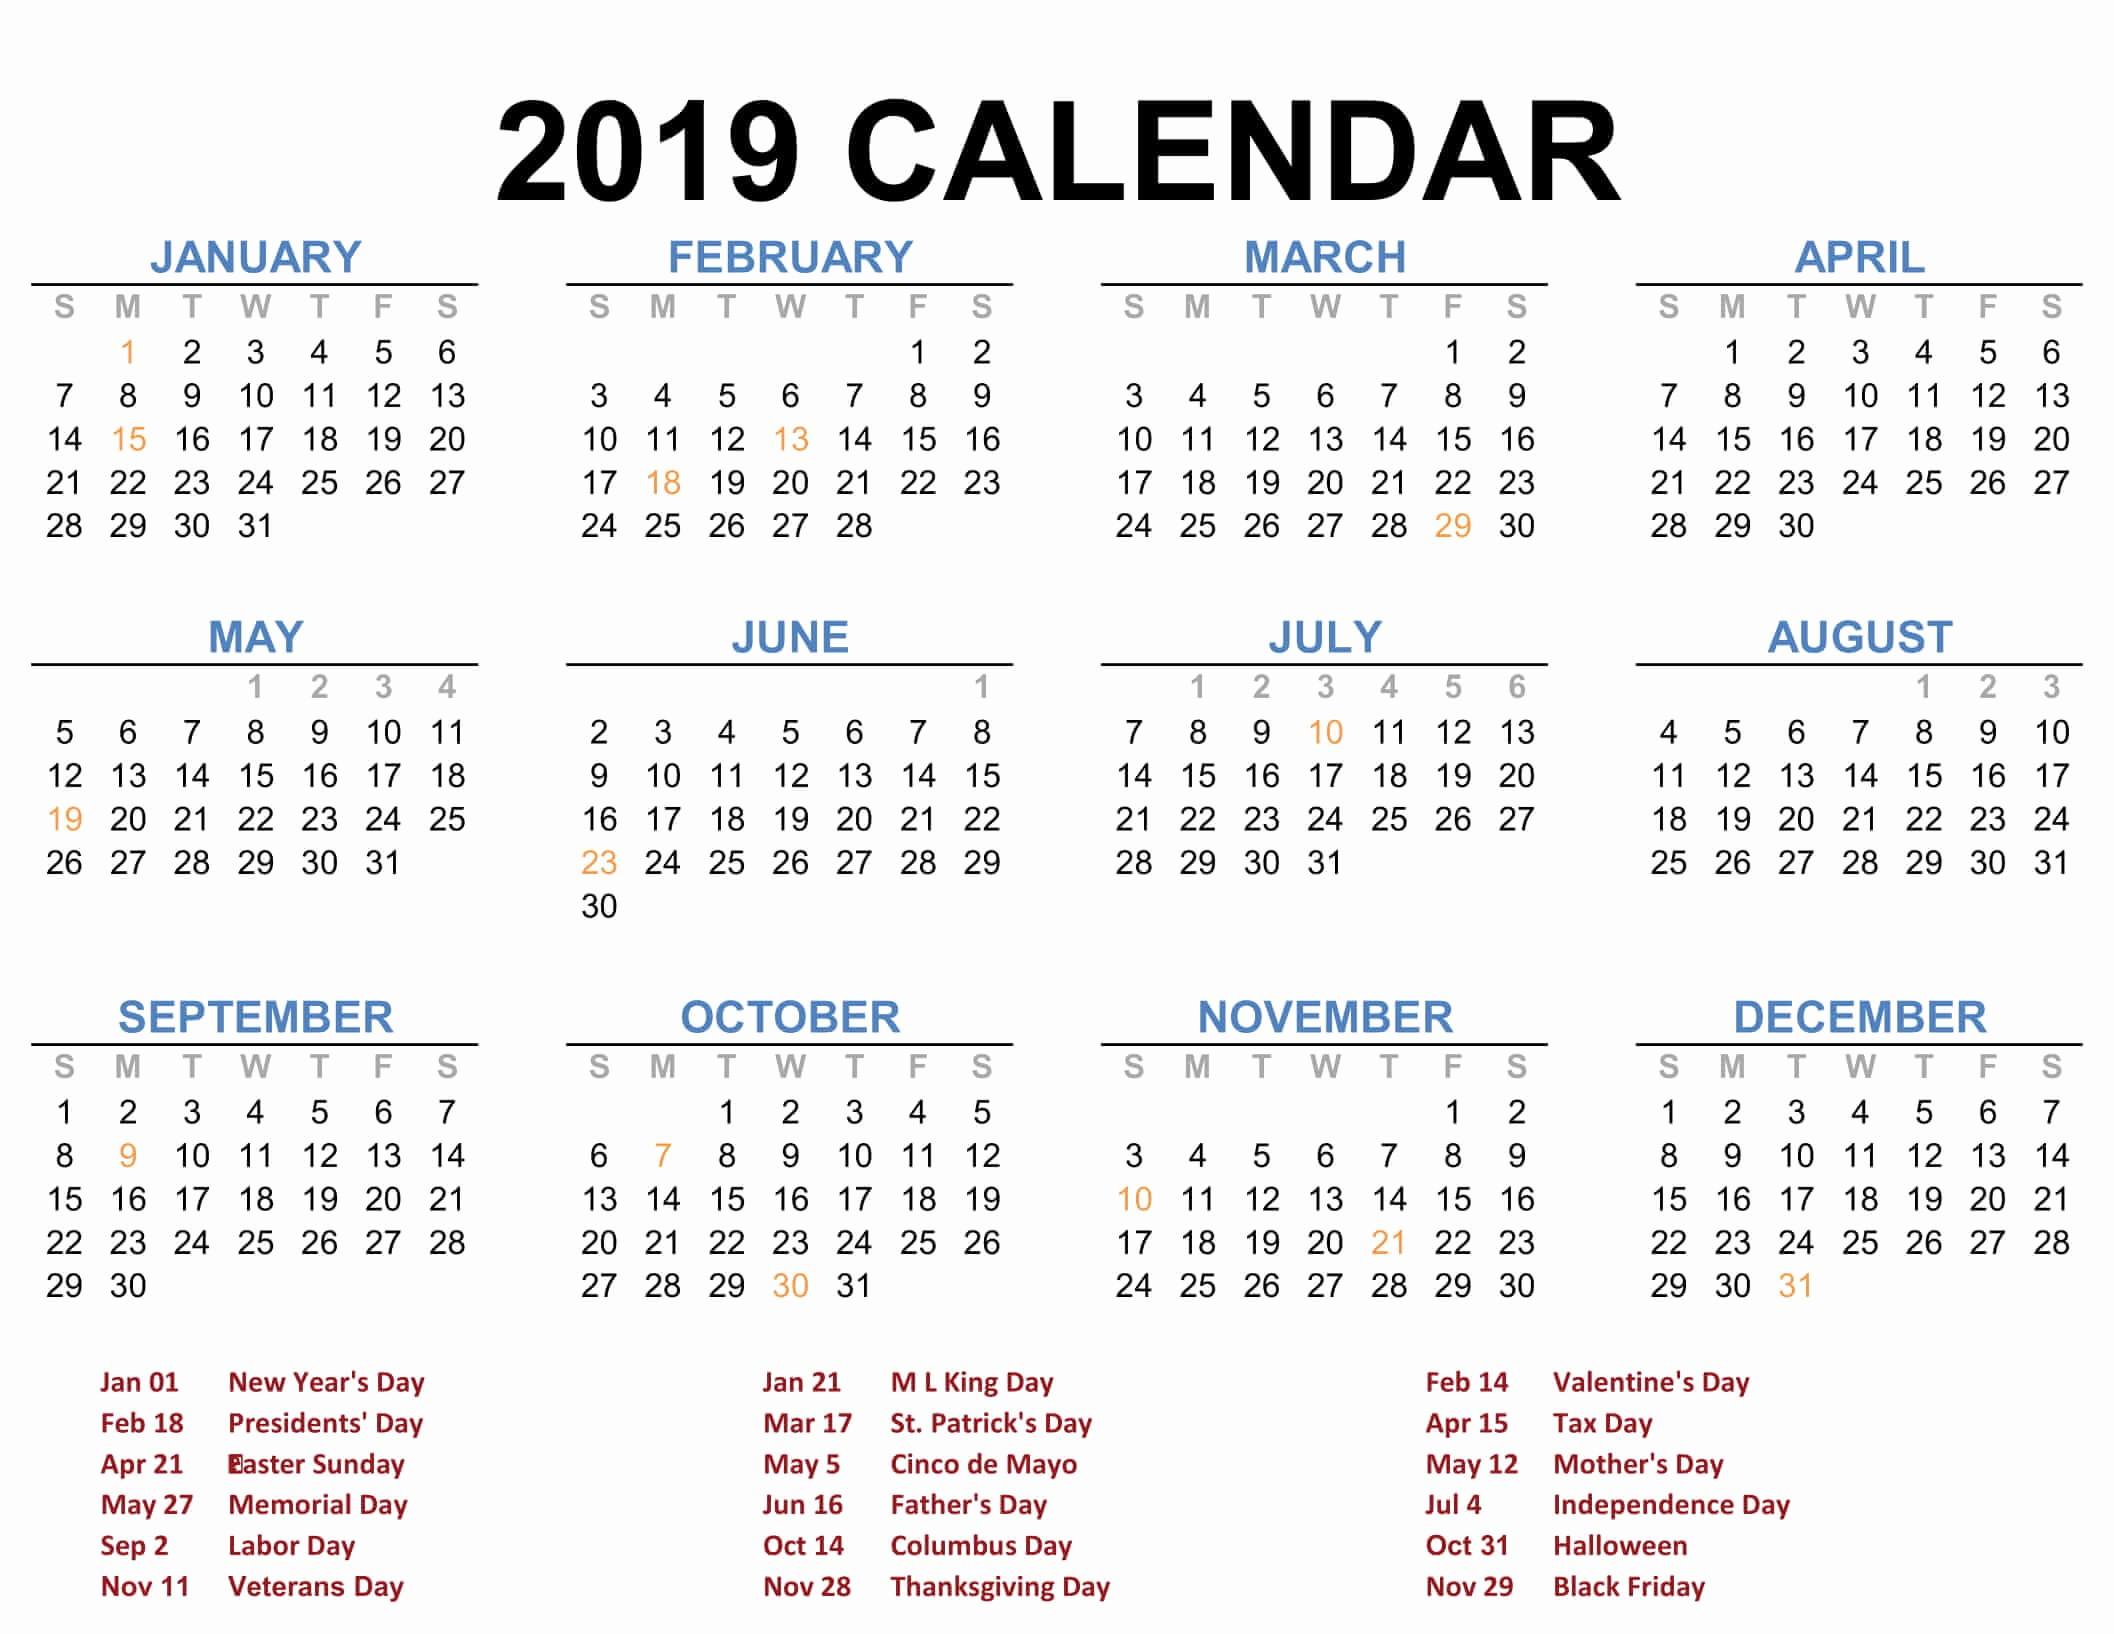 Free Printable 2019 Yearly Calendar Luxury Printable Blank 2019 Calendar Templates Calenndar